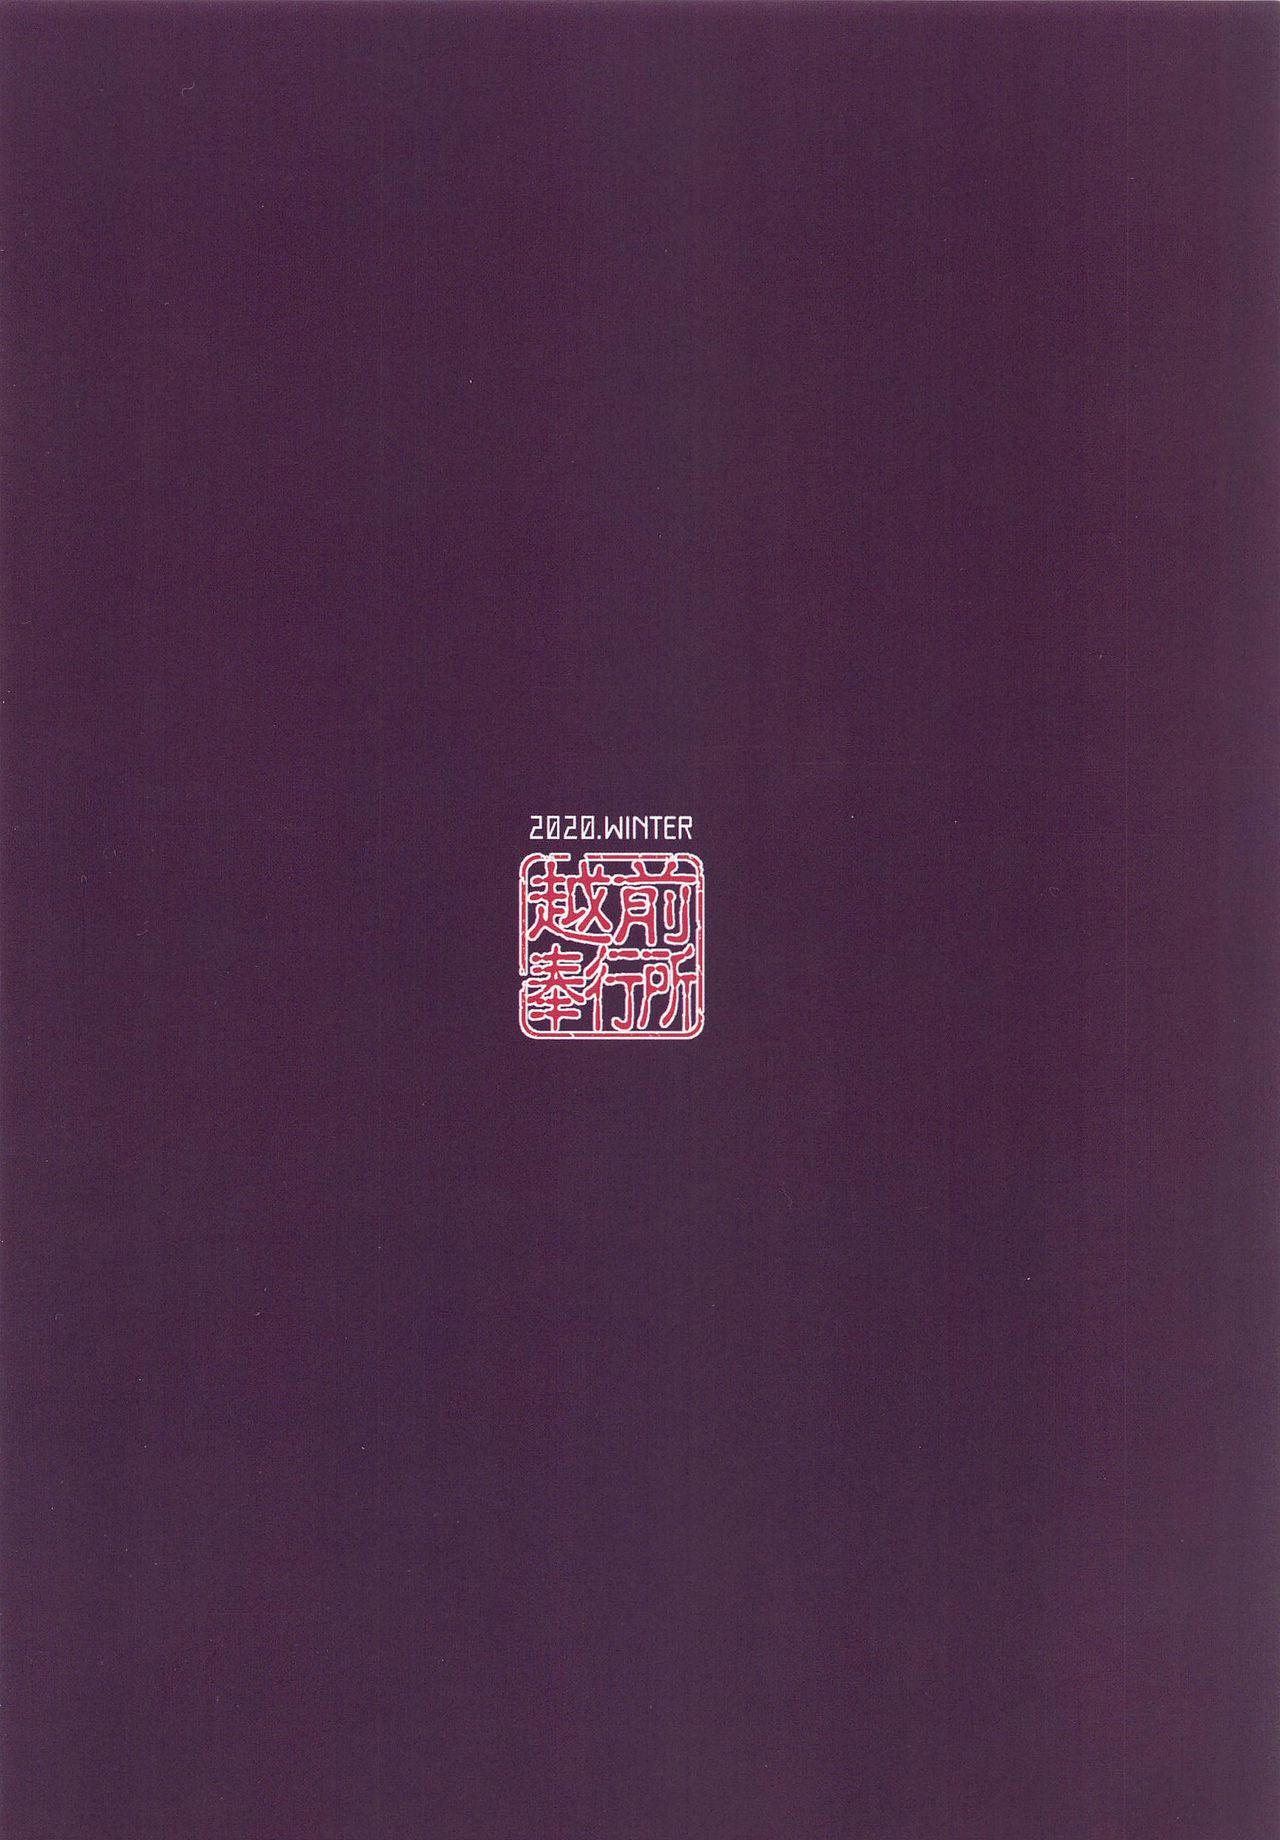 (AC2) [Echizen Bugyousho (Aramaki Echizen)] Baka Shikikan no Osewa (Azur Lane)[Chinese]【不可视汉化】 22